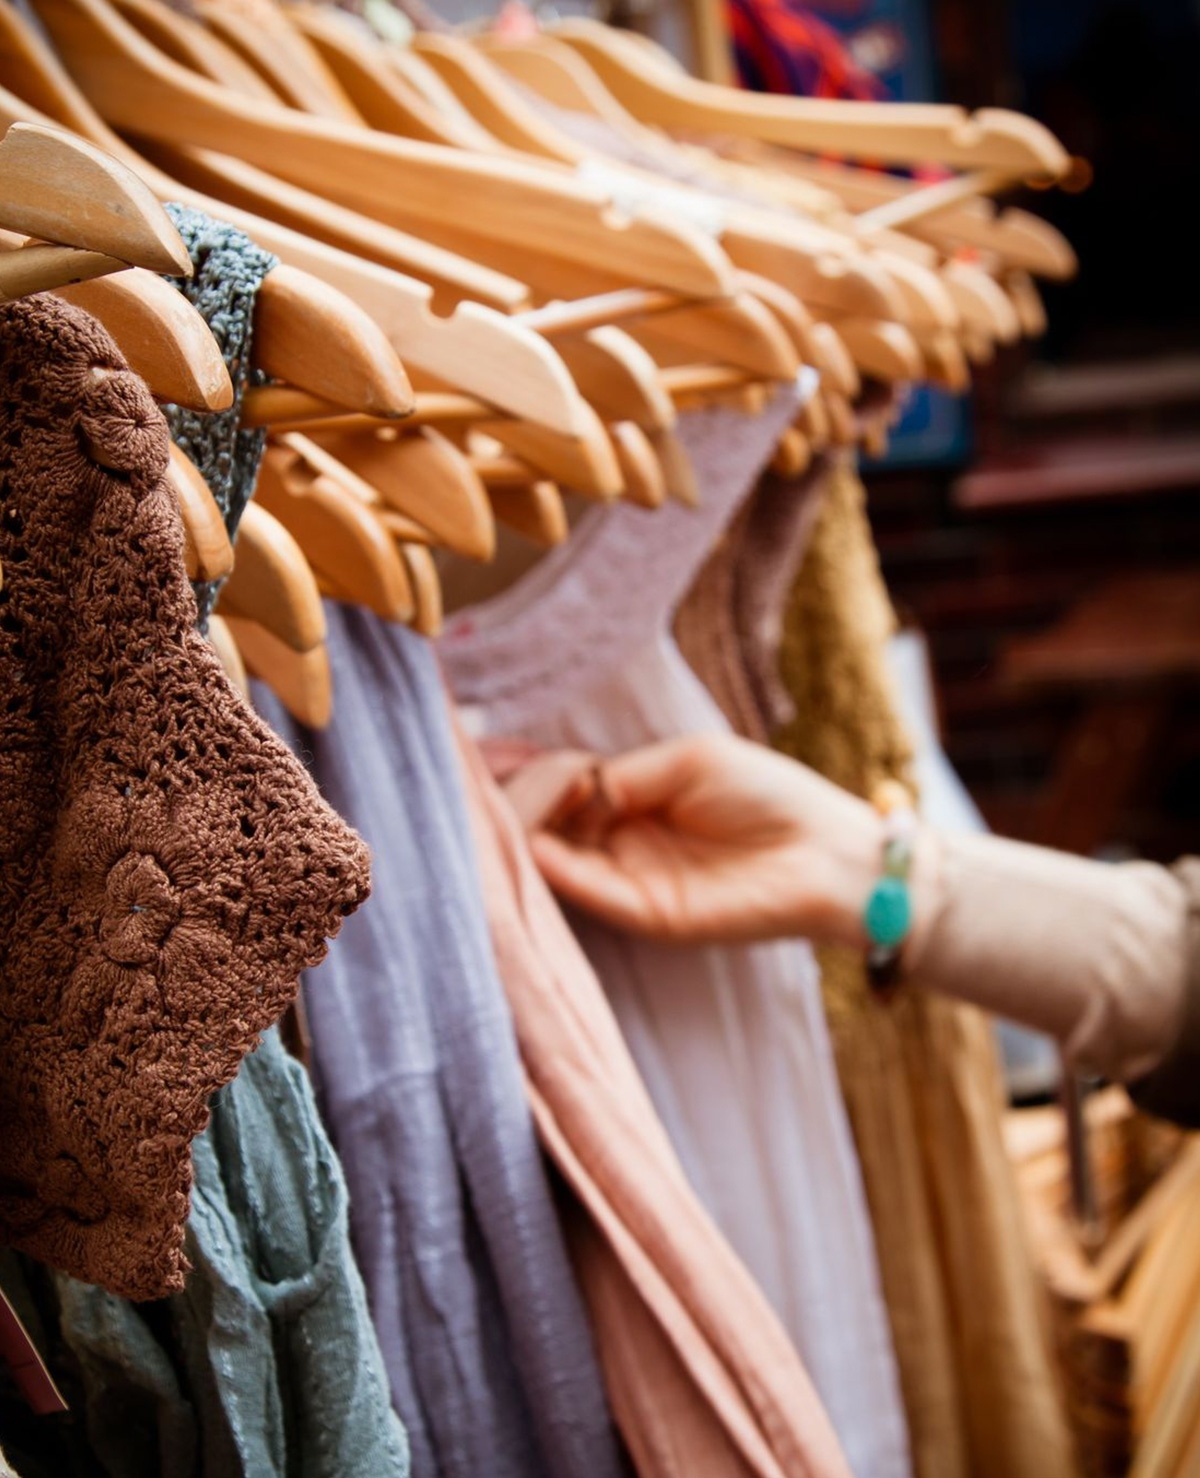 Kleding ruilen: organiseer een kleding swap!